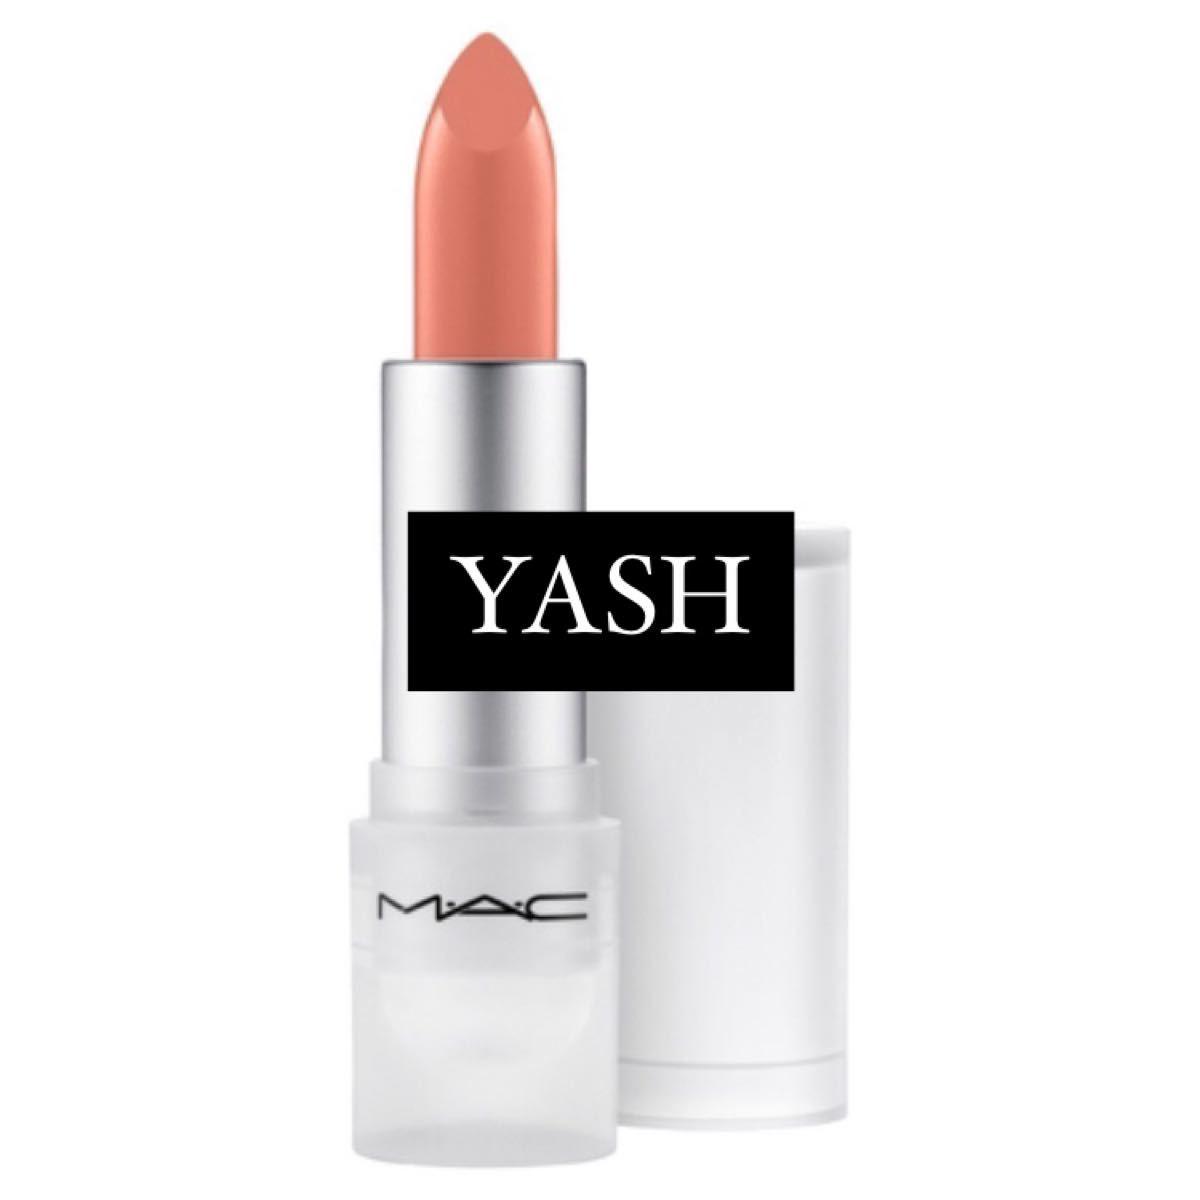 MAC/【YASH】ラウドアンドクリアシリーズ  リップスティック  ヤシュ 口紅  マック